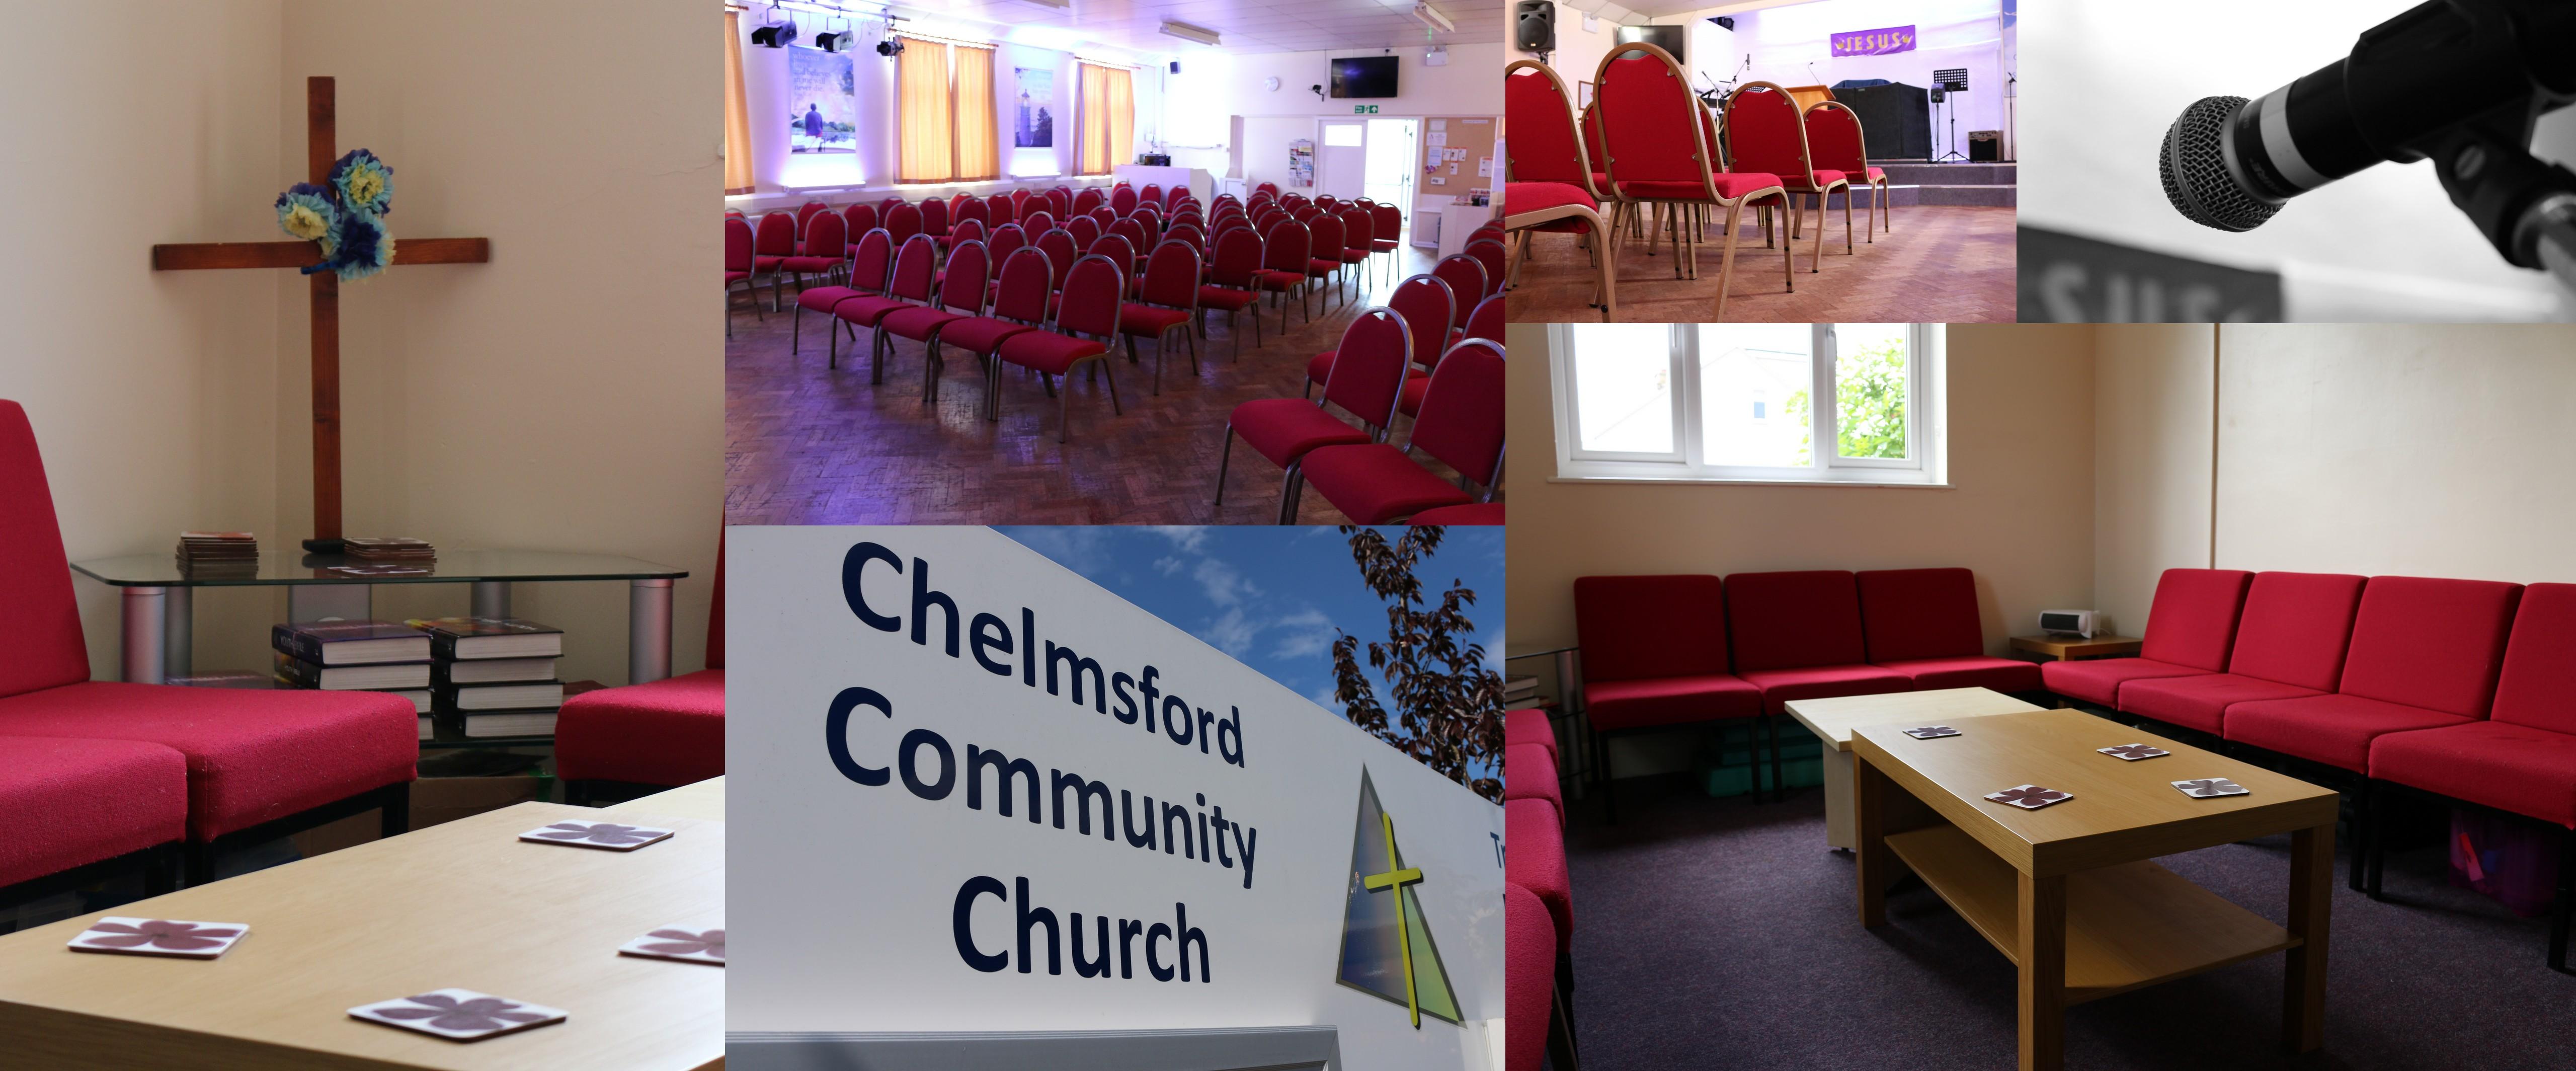 Chelmsford Community Church Room Hire